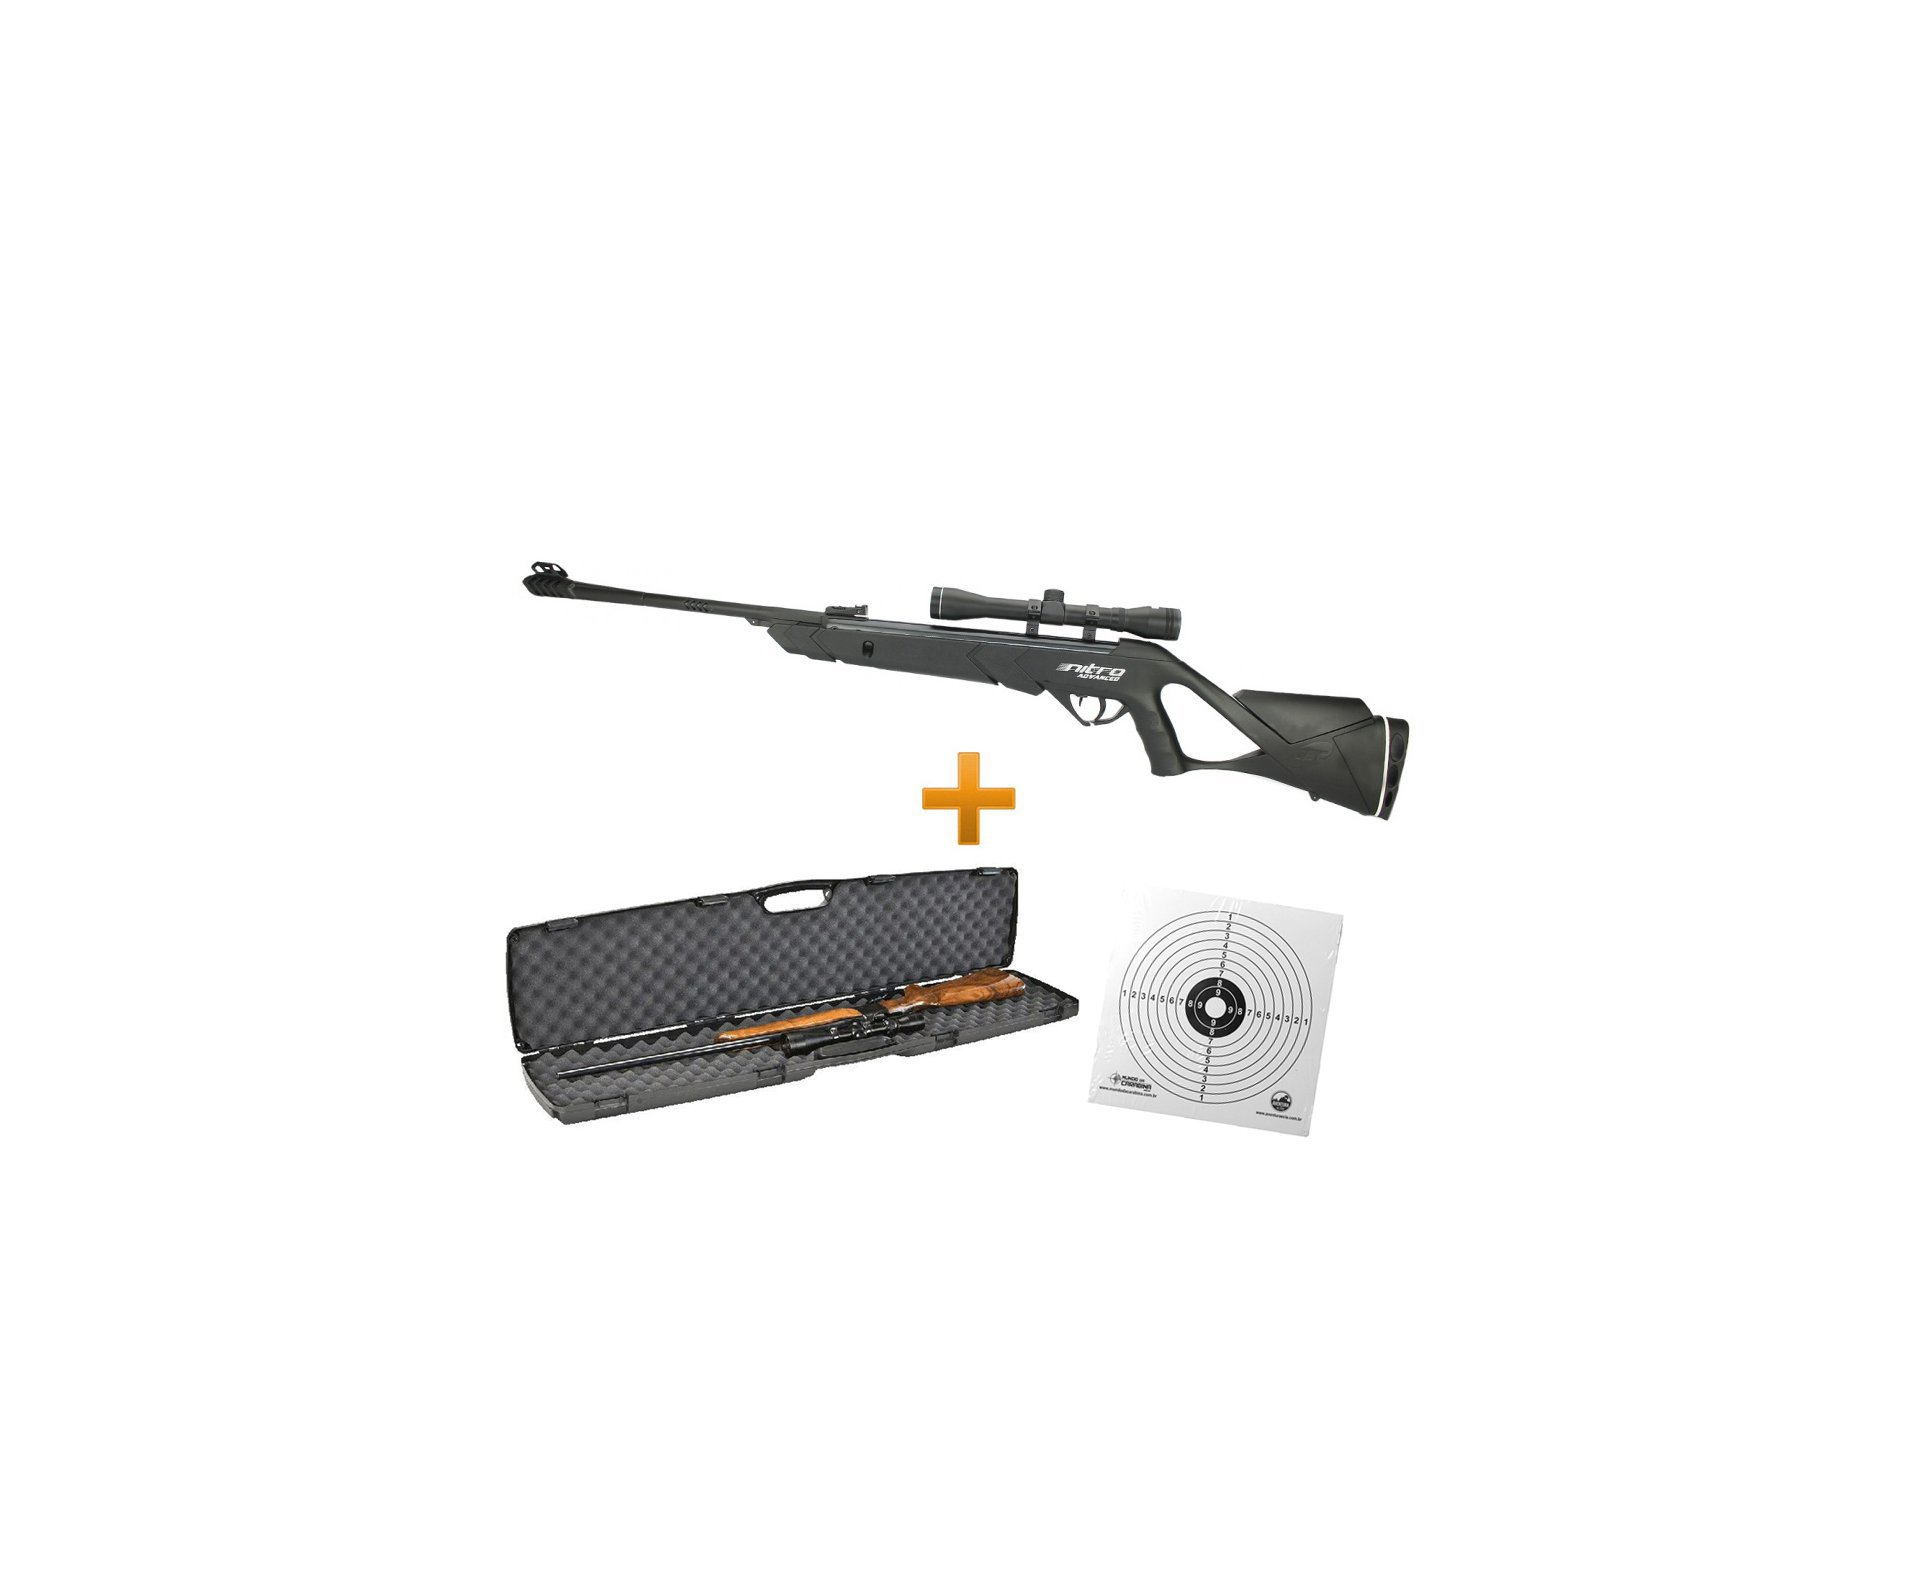 Carabina De Pressão Cbc F22 Advanced Nitro - Cal 5,5 + Luneta 4x32 + Case Plano + 50 Alvos Descartáveis